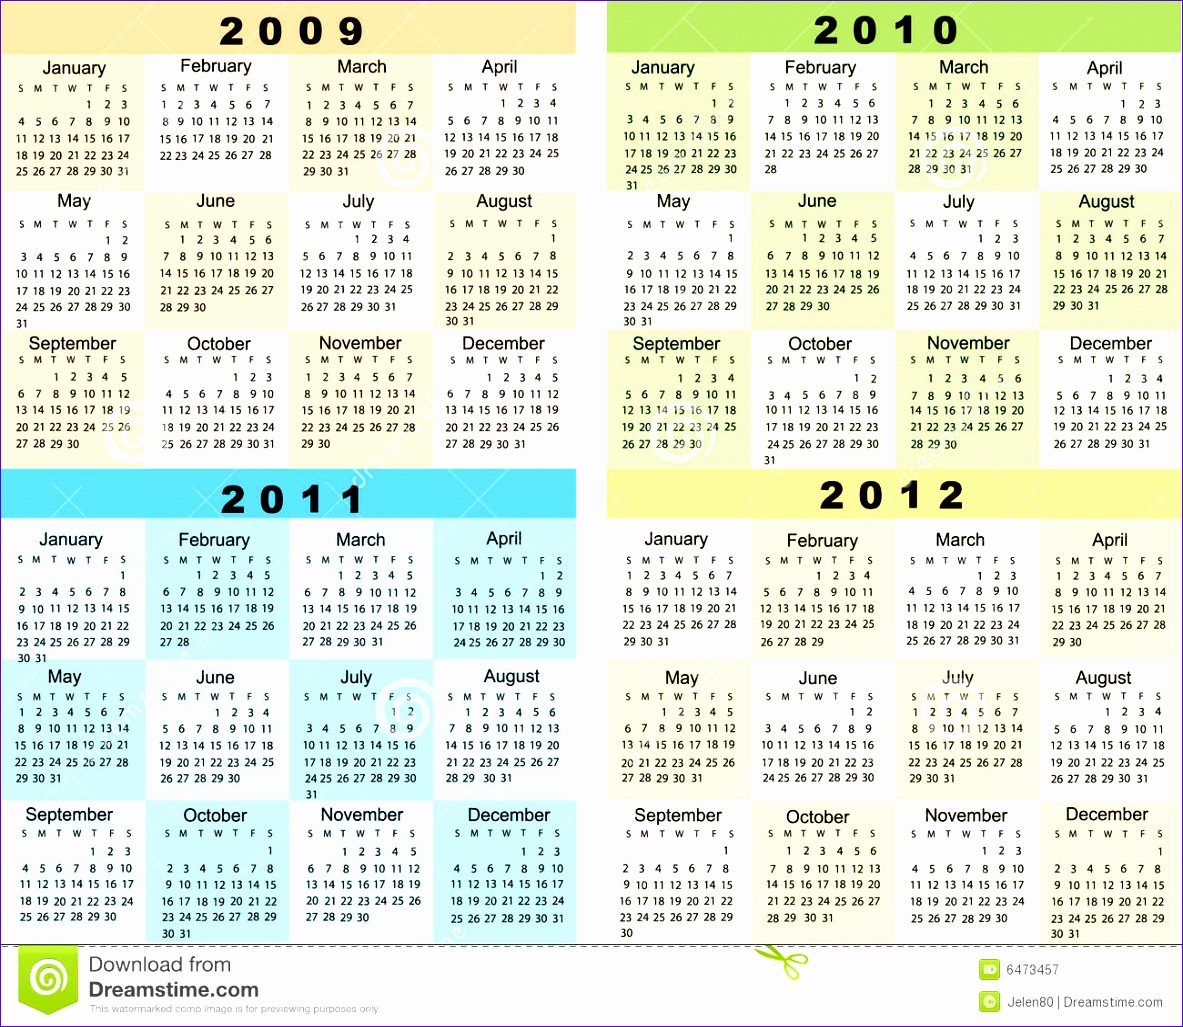 printable 2012 2013 2014 calendar 11831027